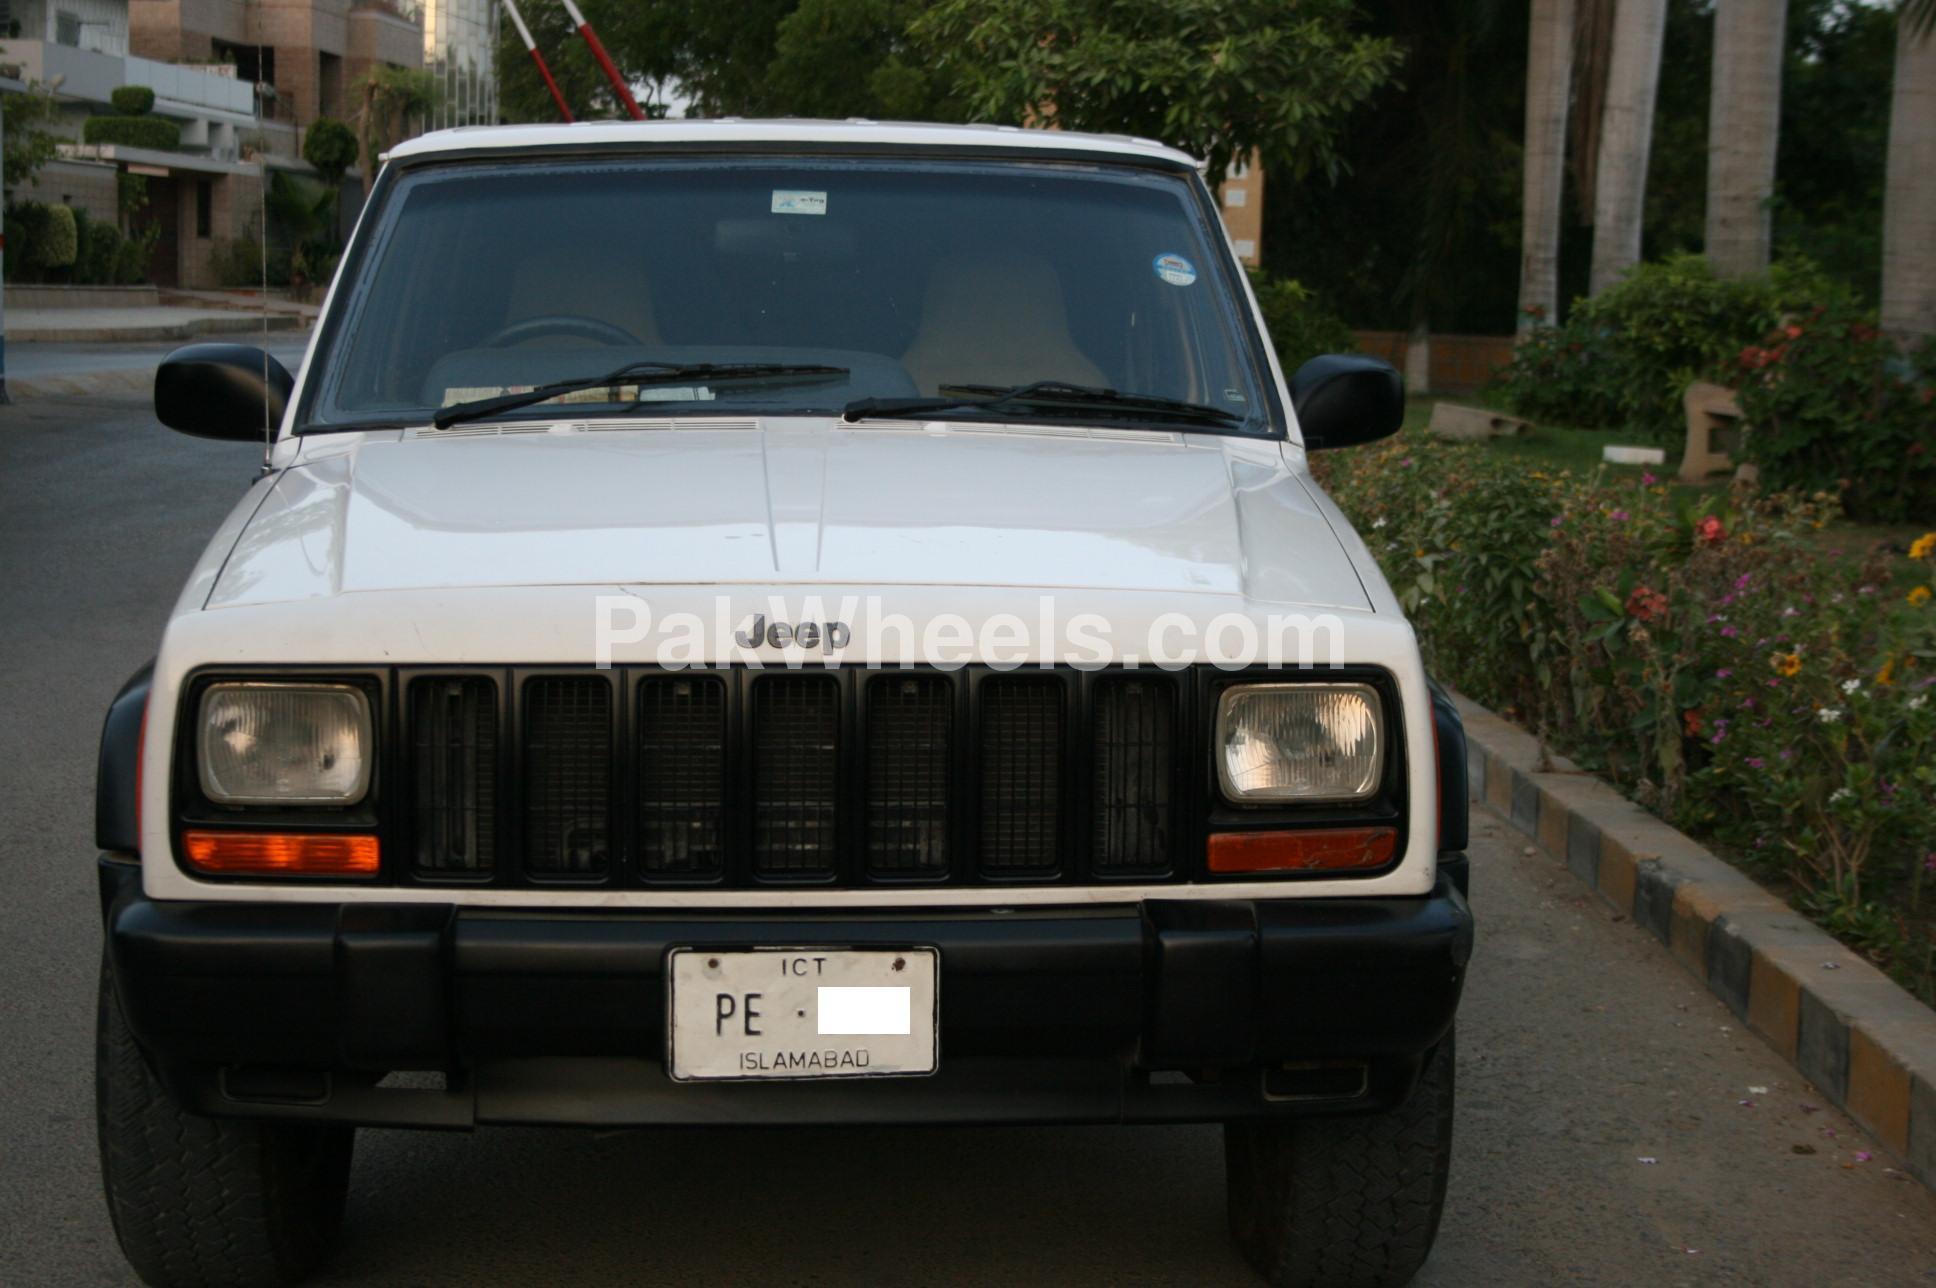 Jeep Cherokee 1997 for sale in Karachi